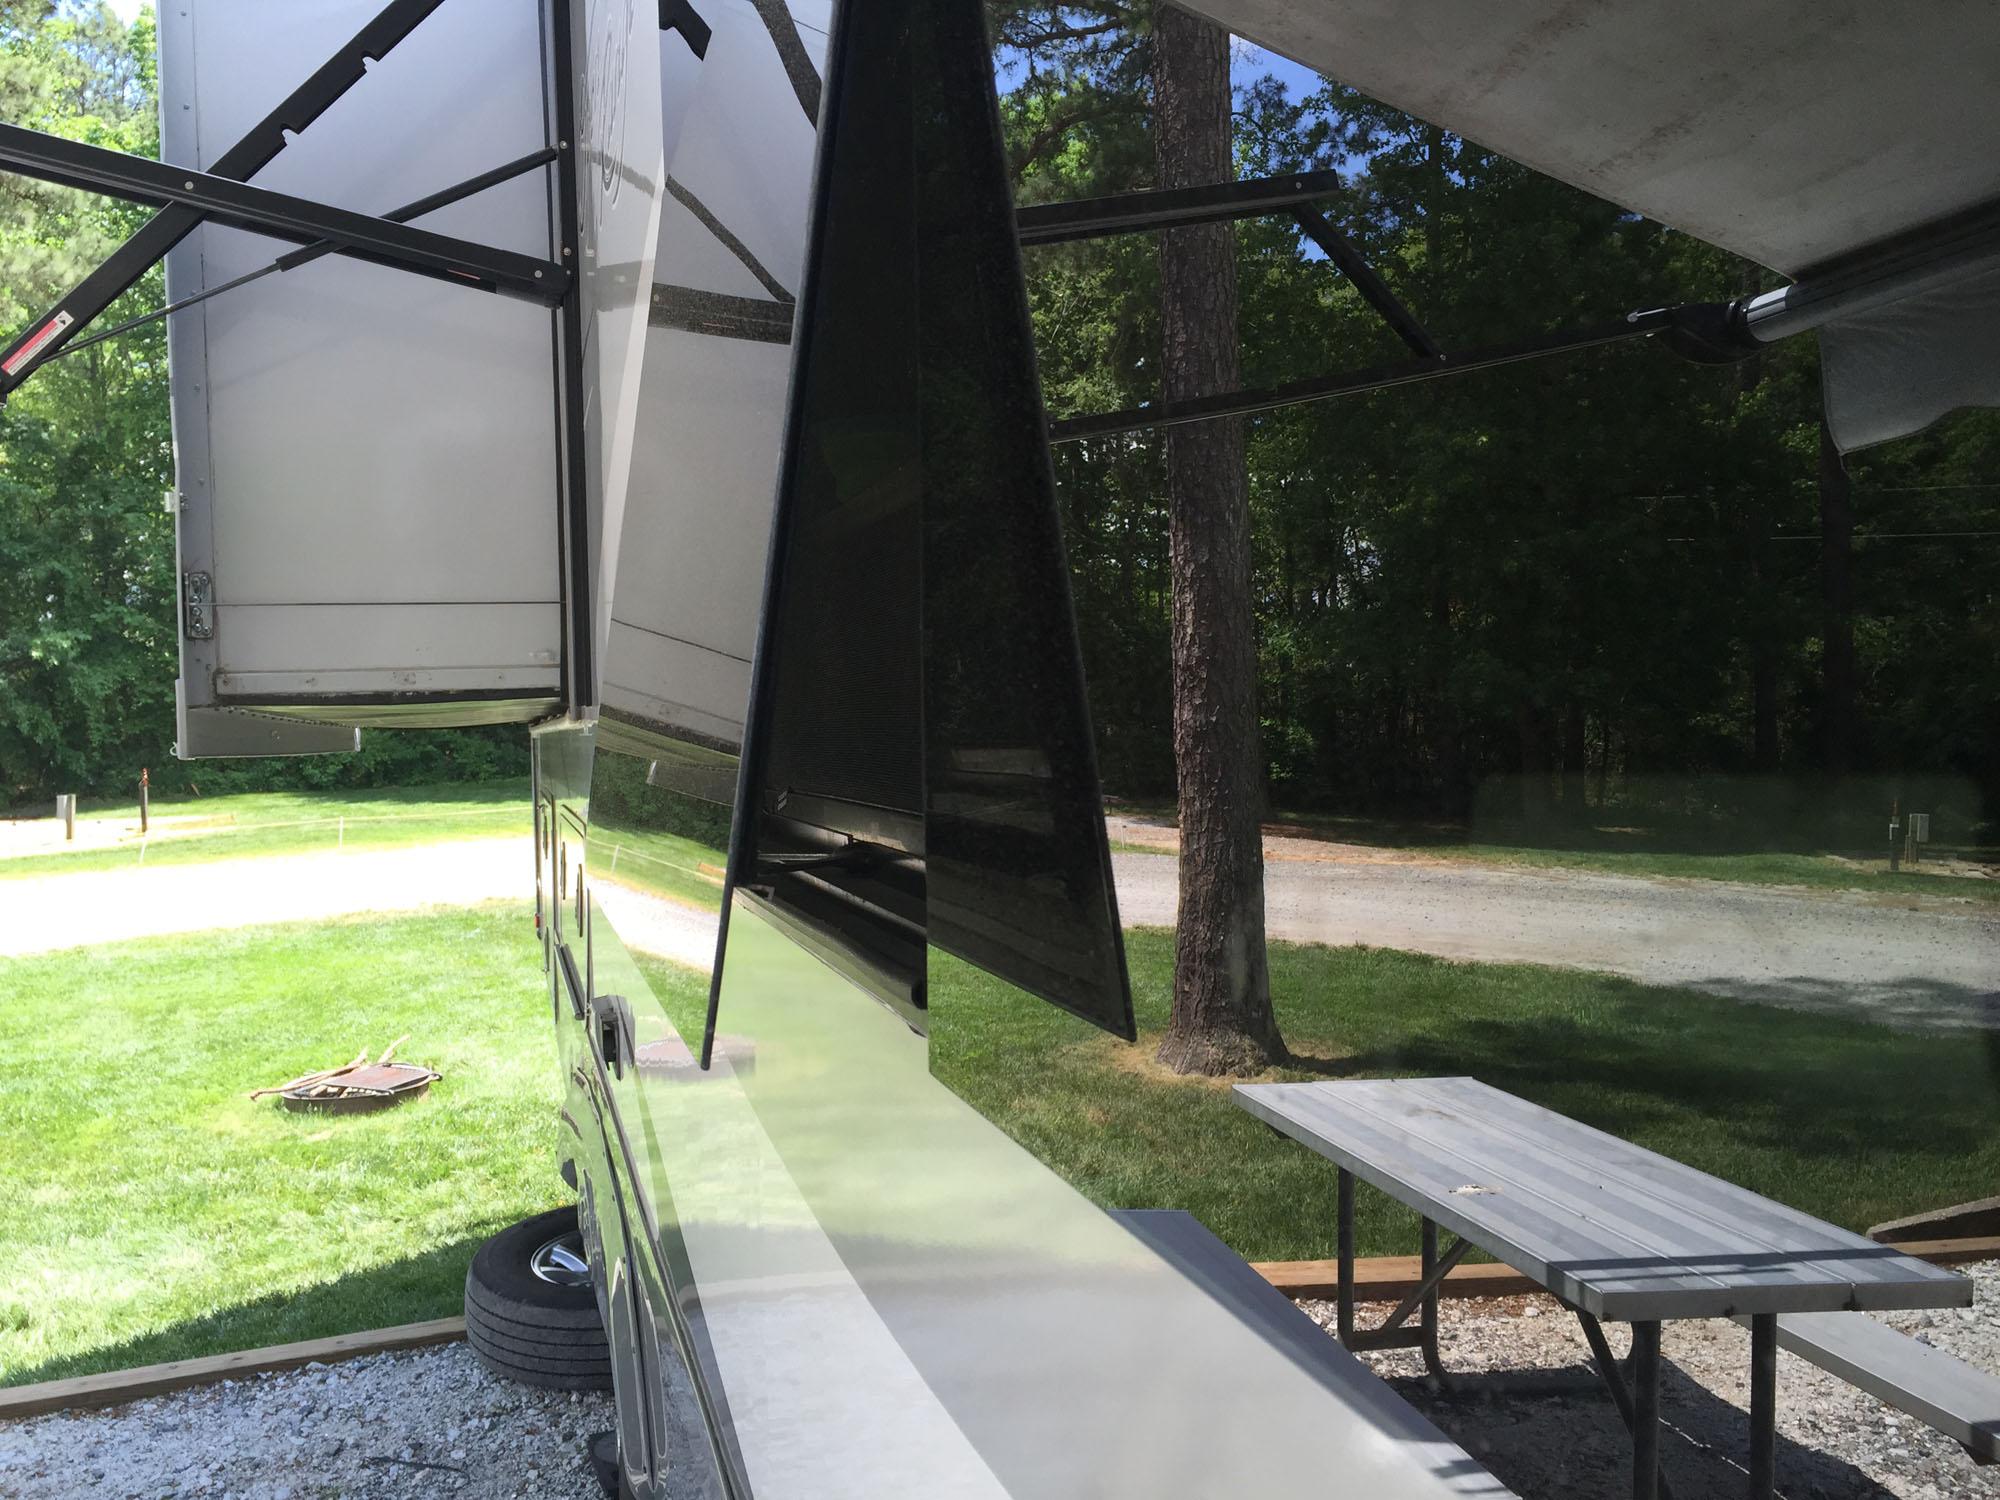 DIY RV Mods (Inside) | Camper Chronicles